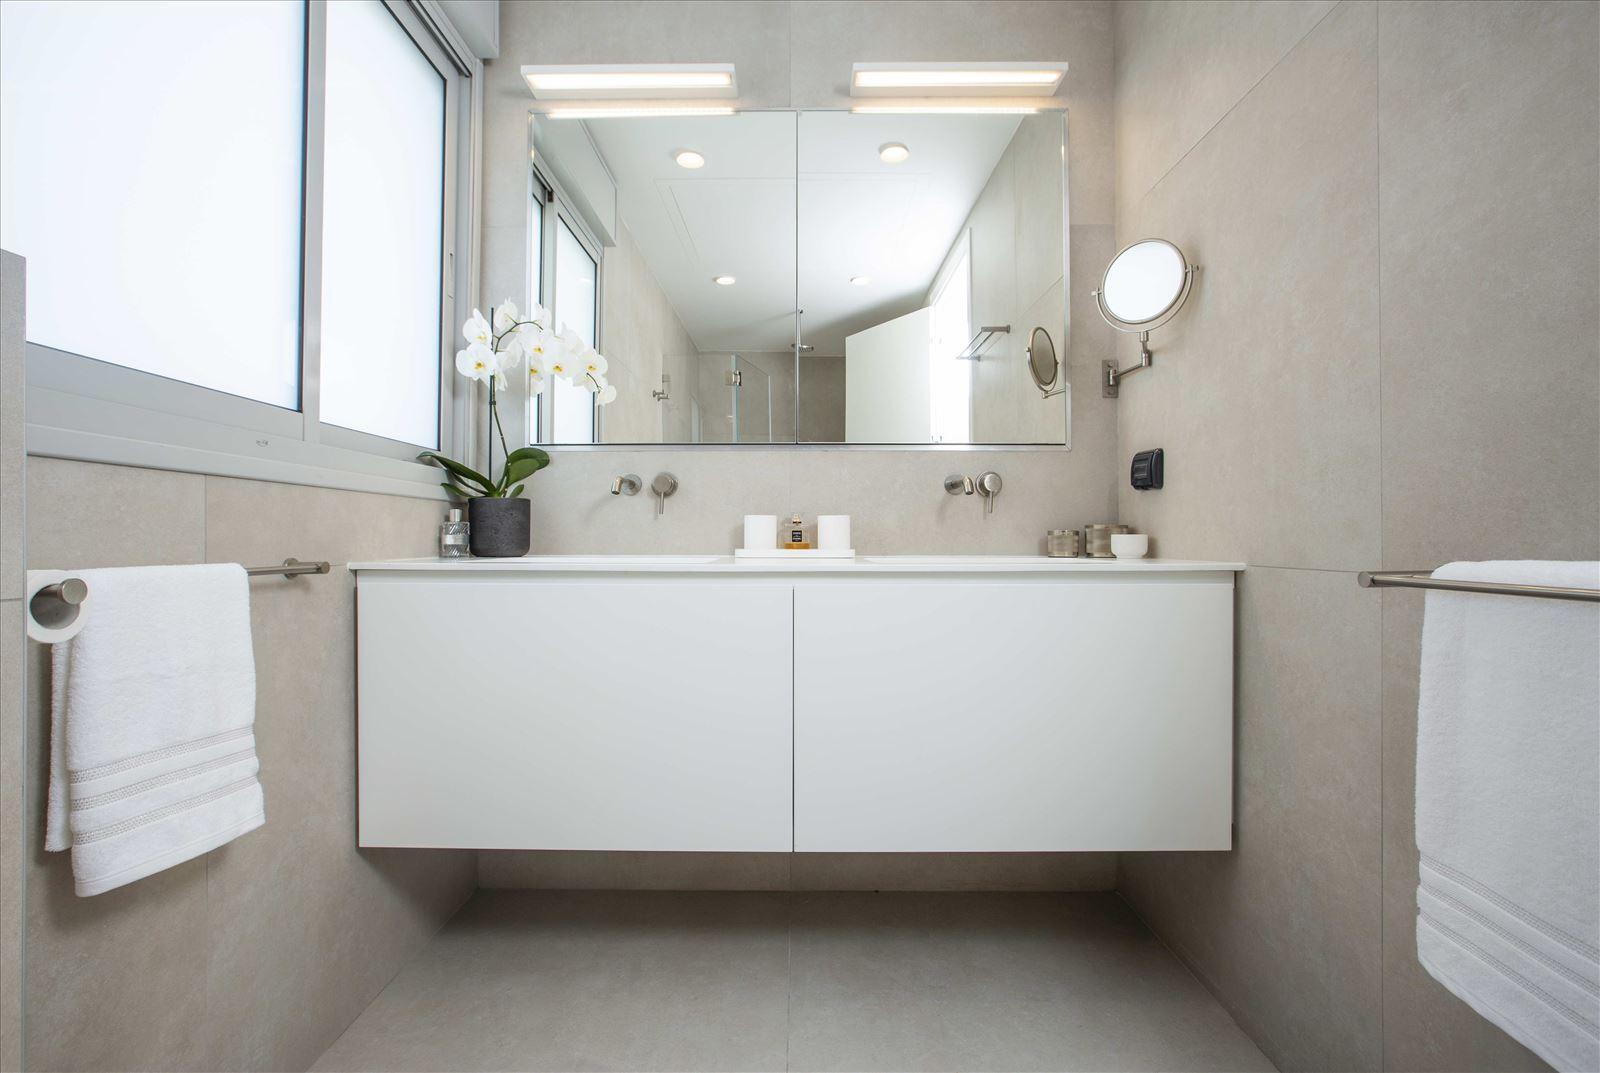 Tel Aviv apartment in Parisian aroma תאורה במקלחת מבית דורי קמחי